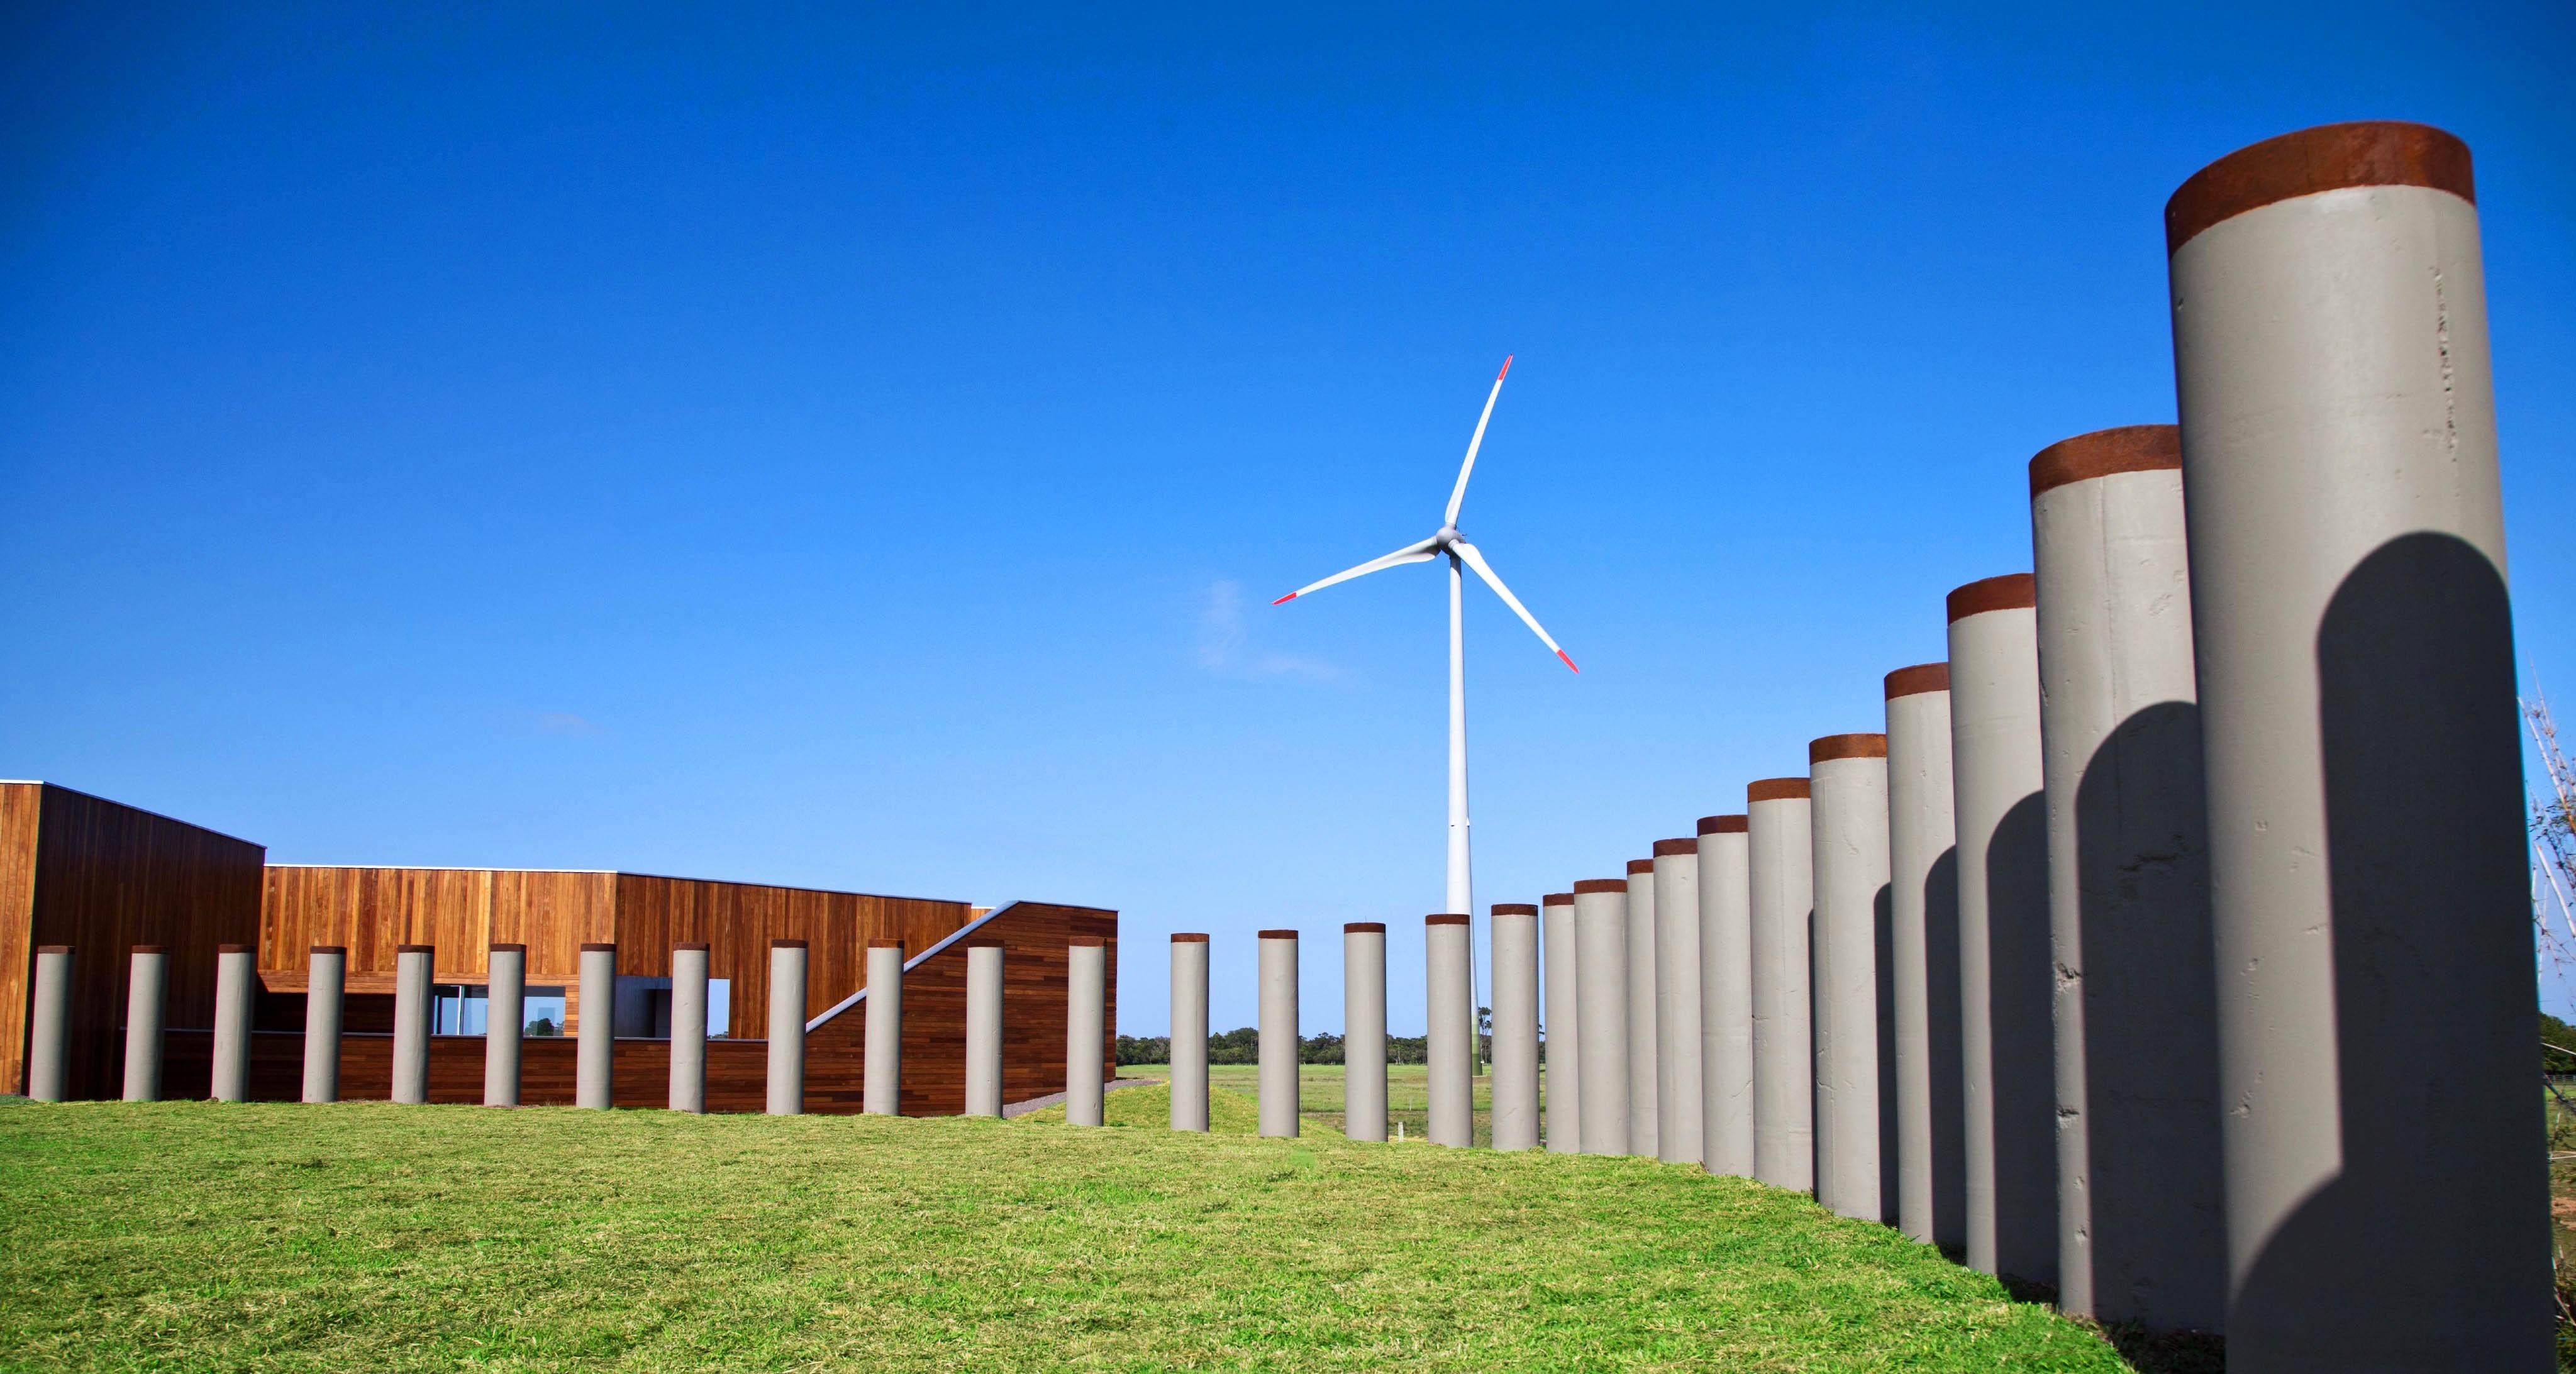 Auditorio parques eólicos de Osório. Brasil